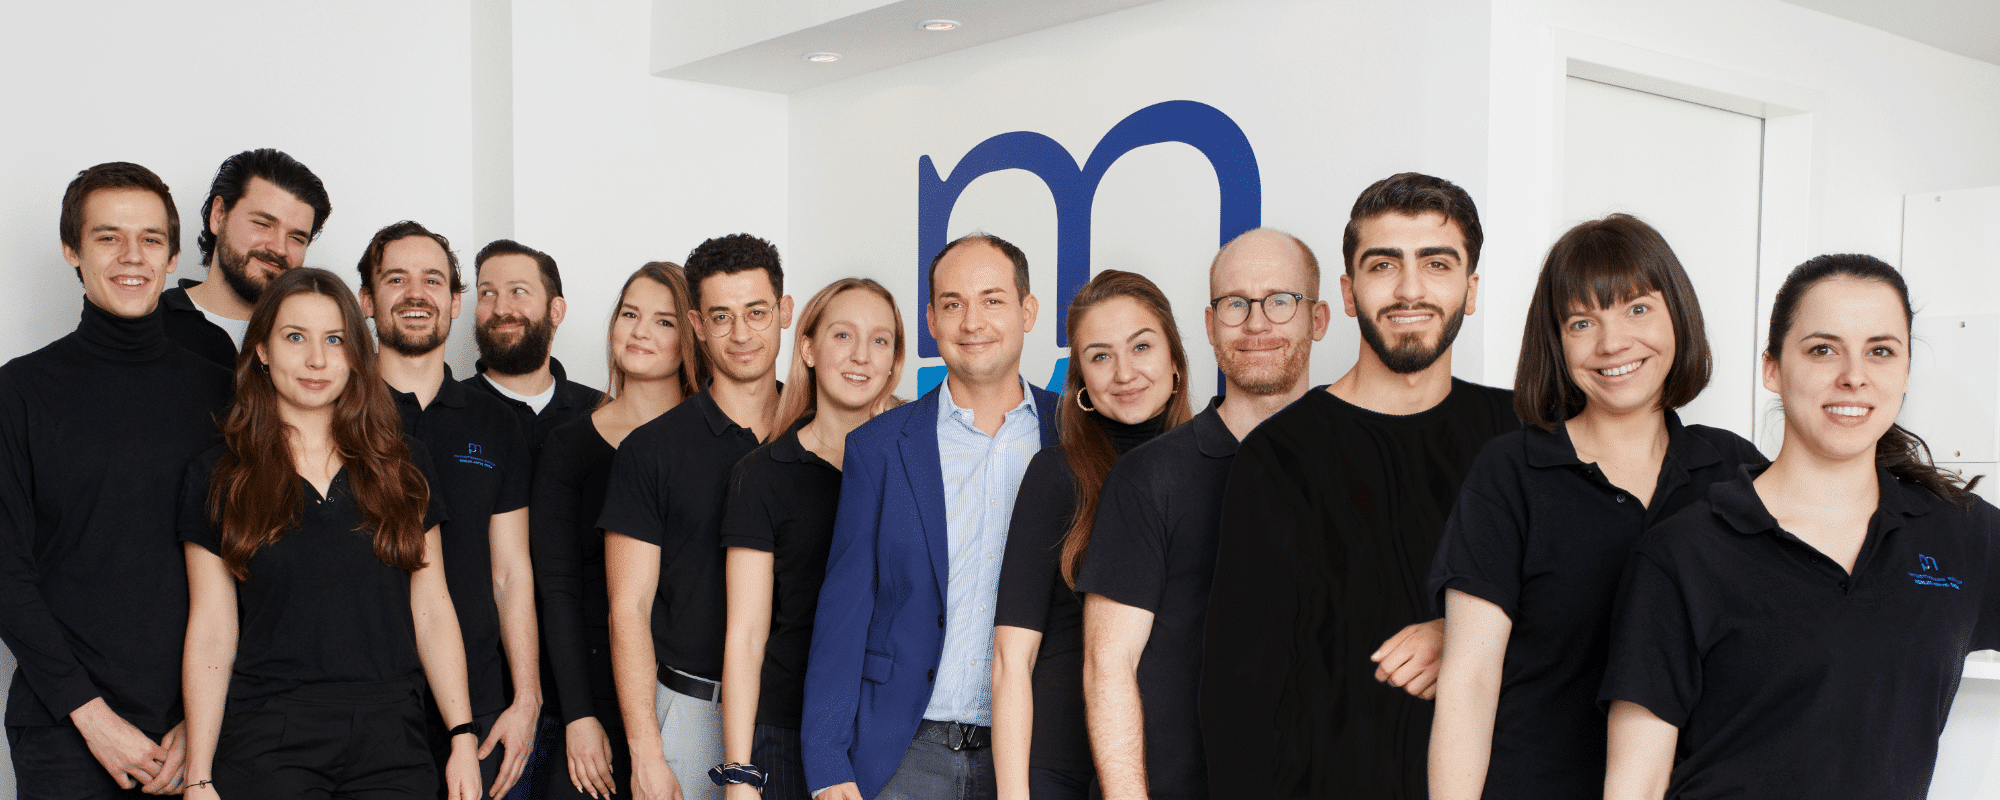 Physiotherapie Berlin Mitte Praxis Team 2020